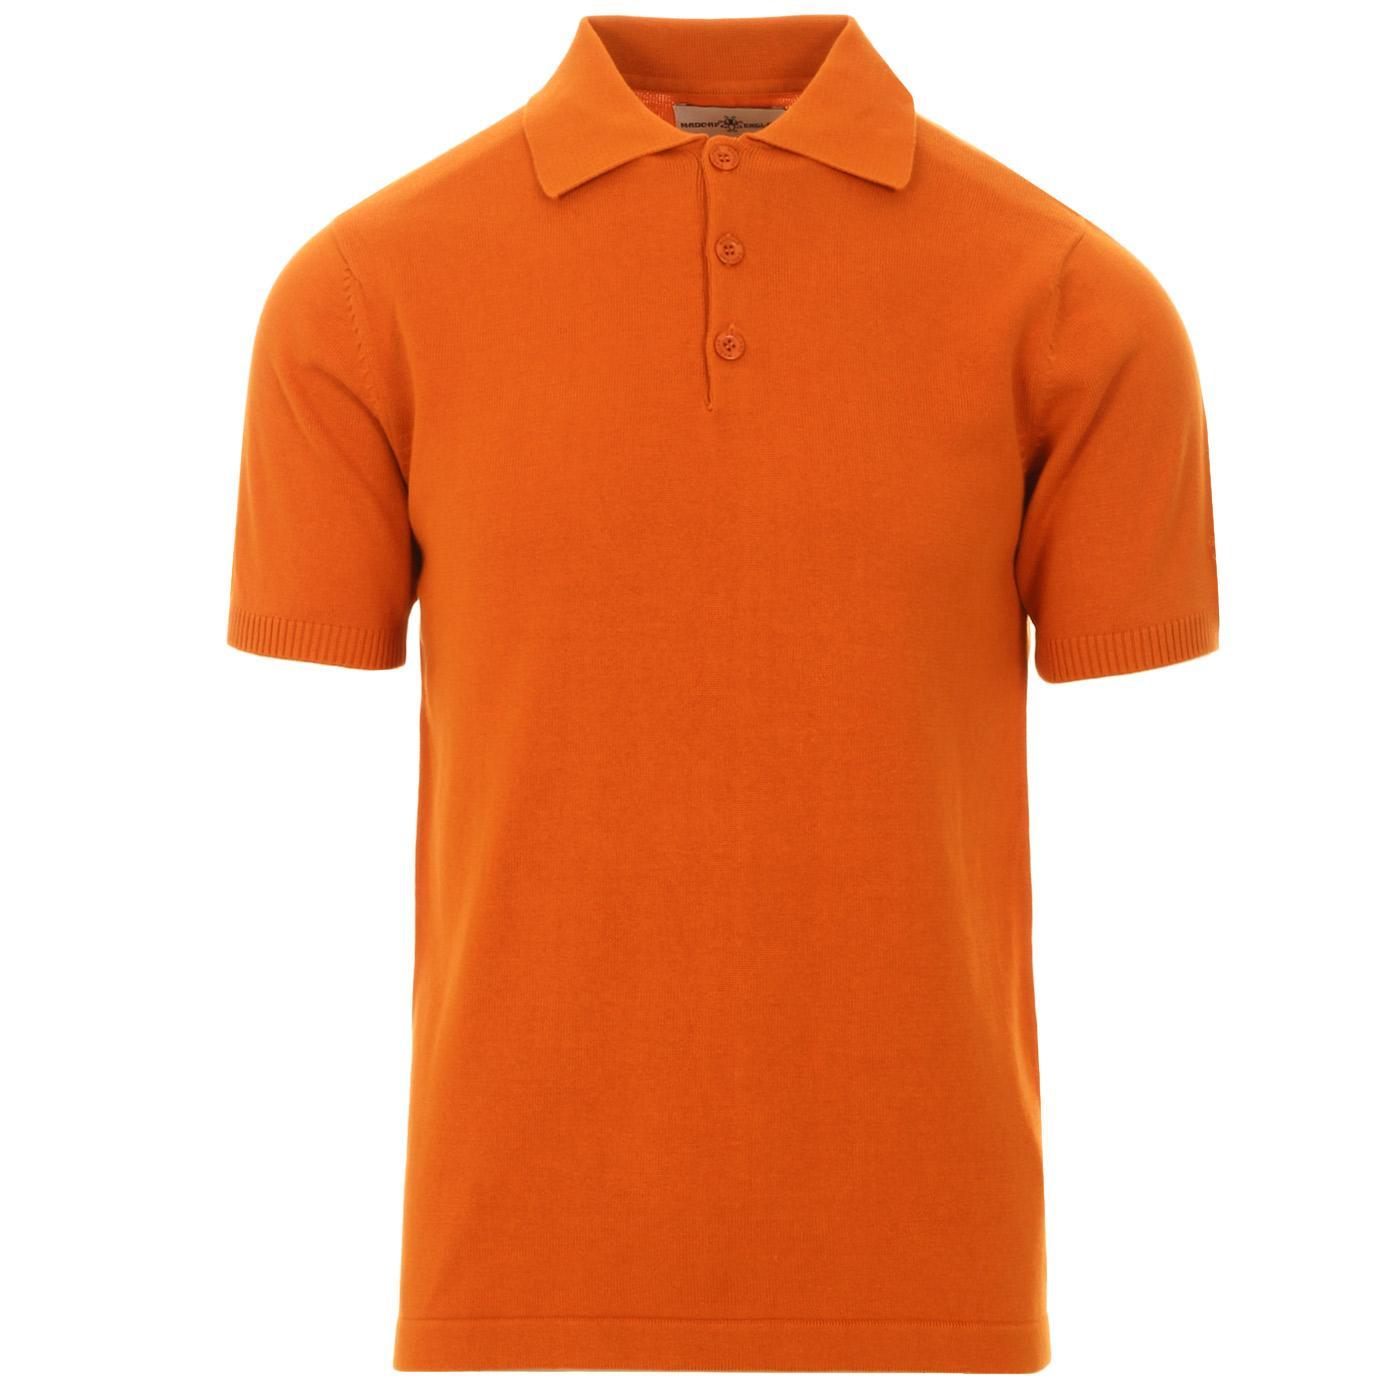 Madcap England Brando SS 60s Mod Knitted Polo Shirt in Marmalade